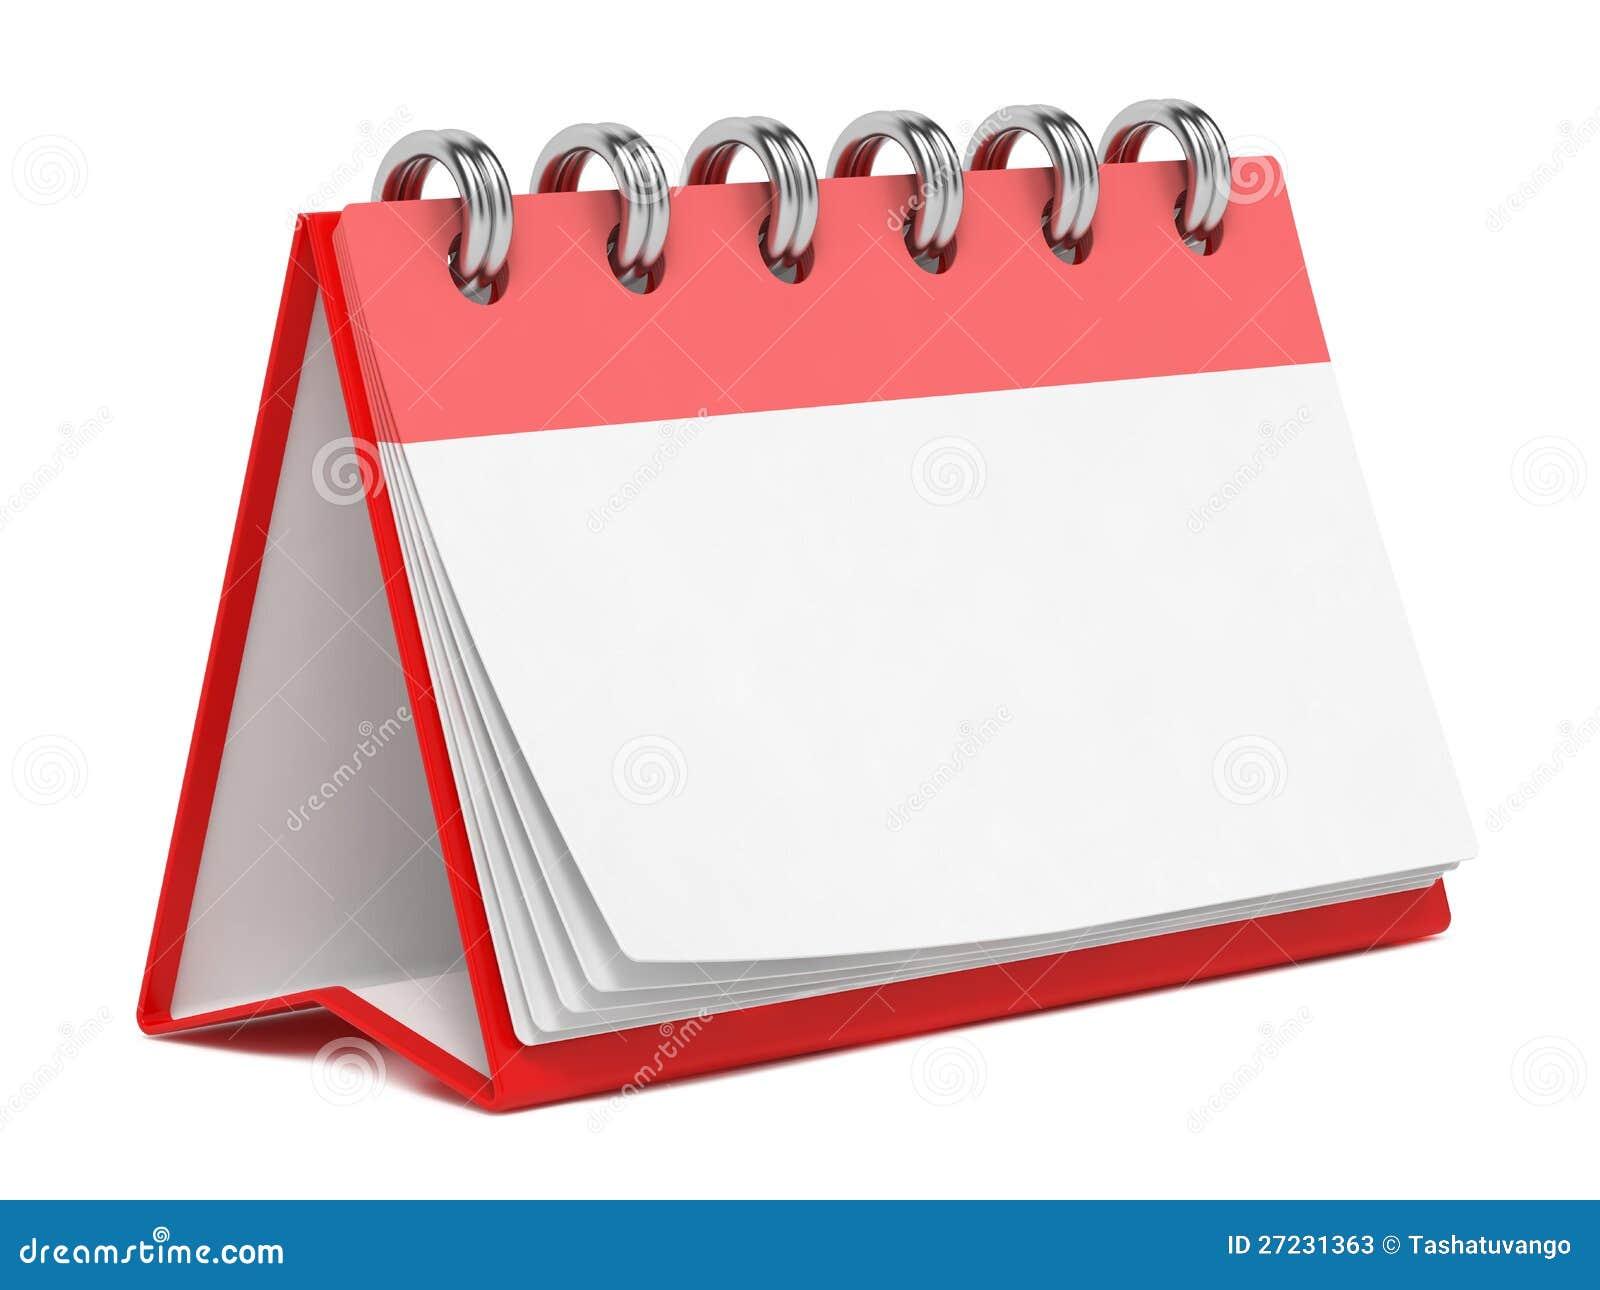 Blank Desktop Calendar Isolated On White. Stock Photos - Image ...